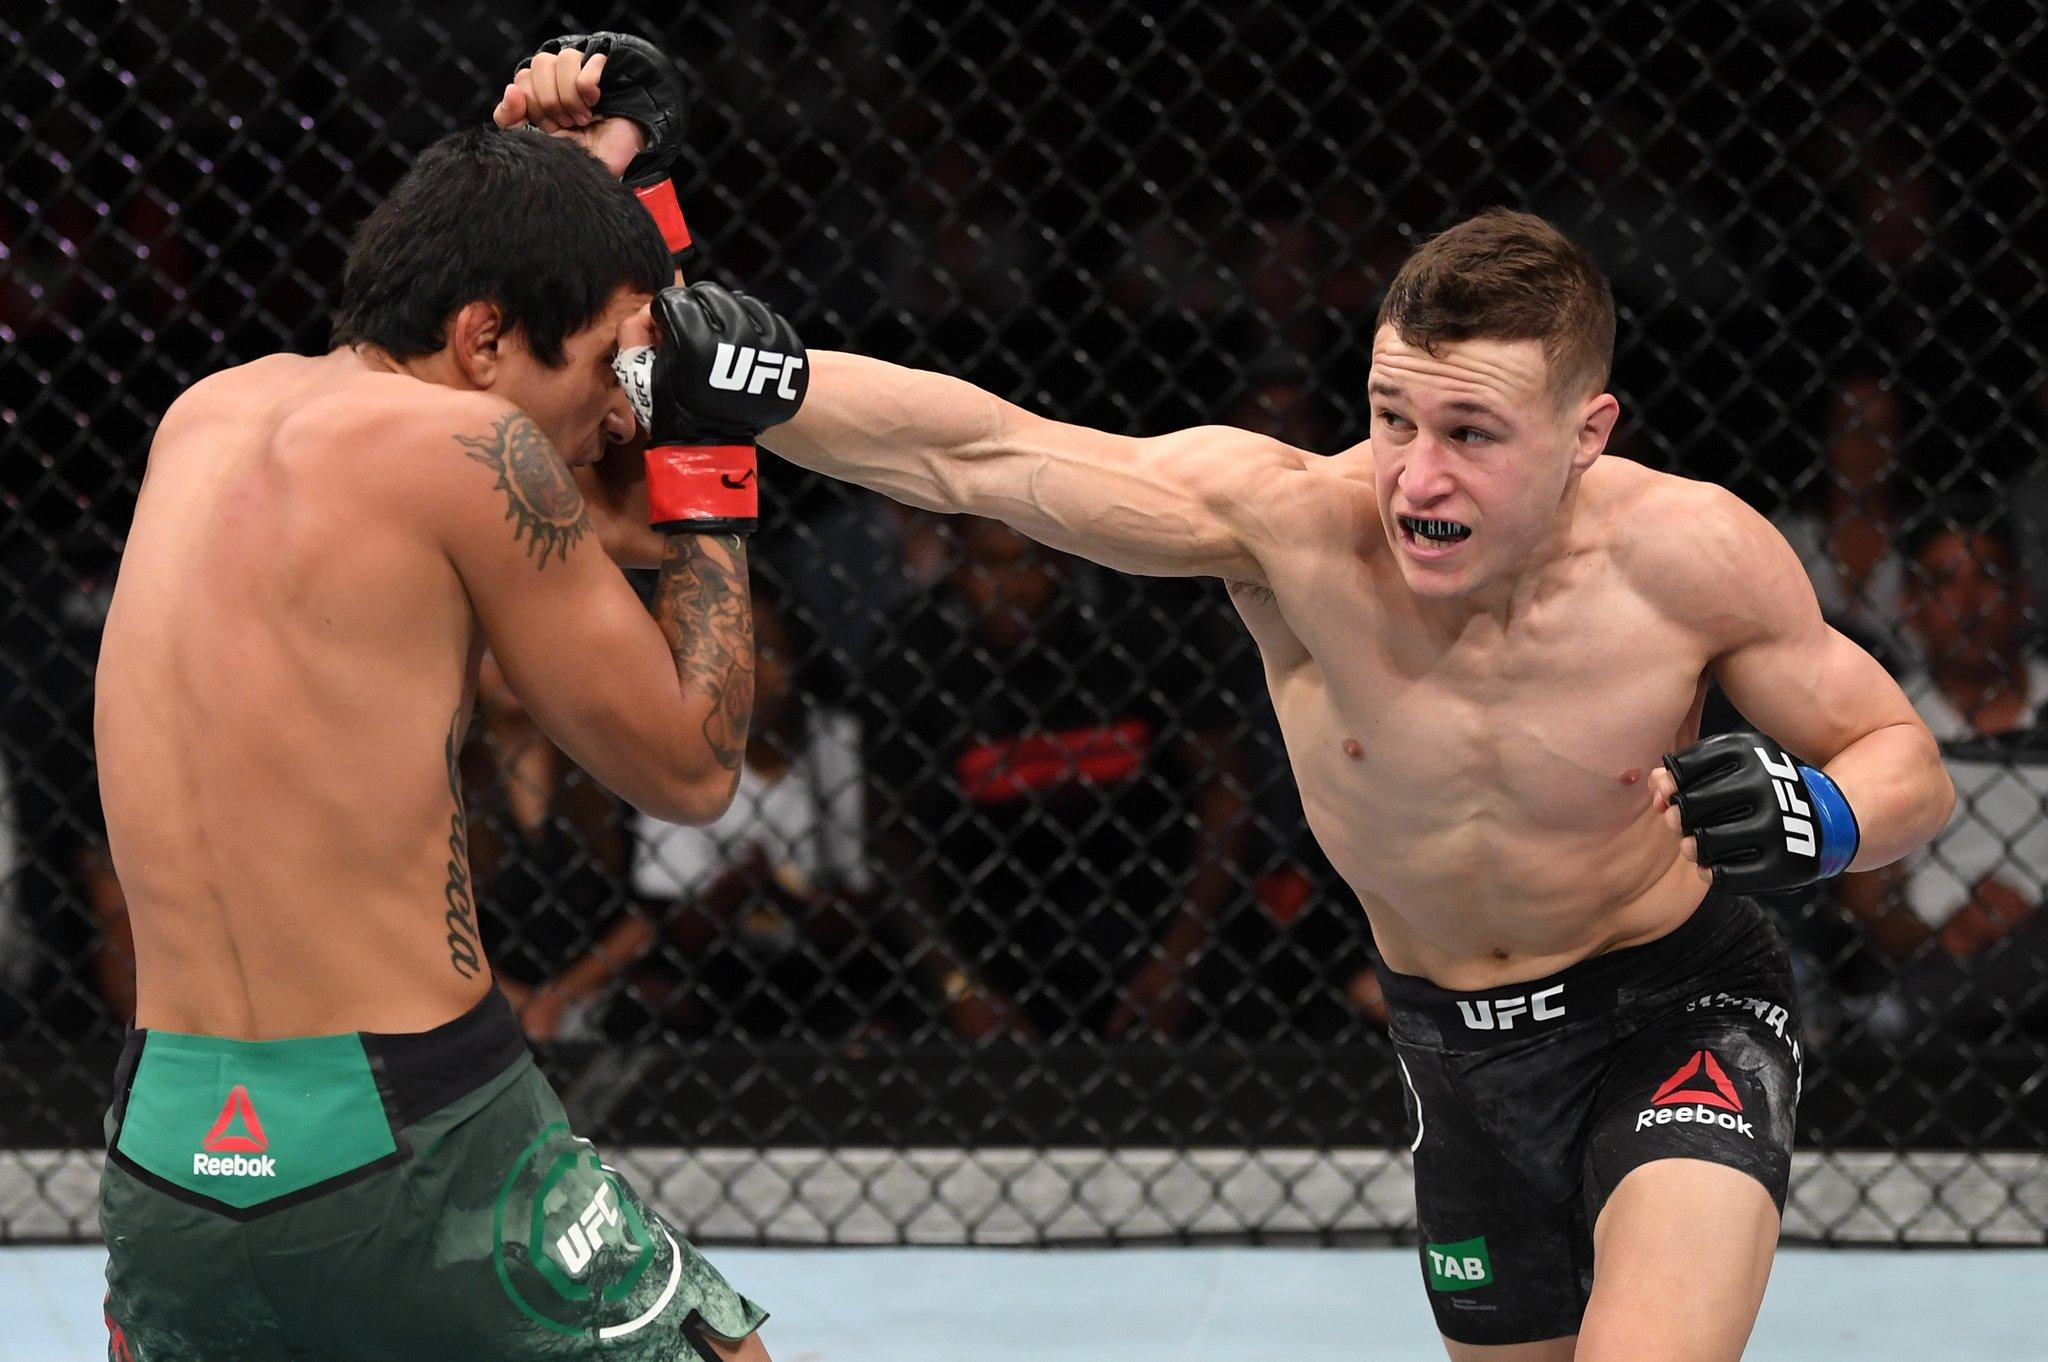 Kai Kara France reacts to his brilliant performance on UFC debut -